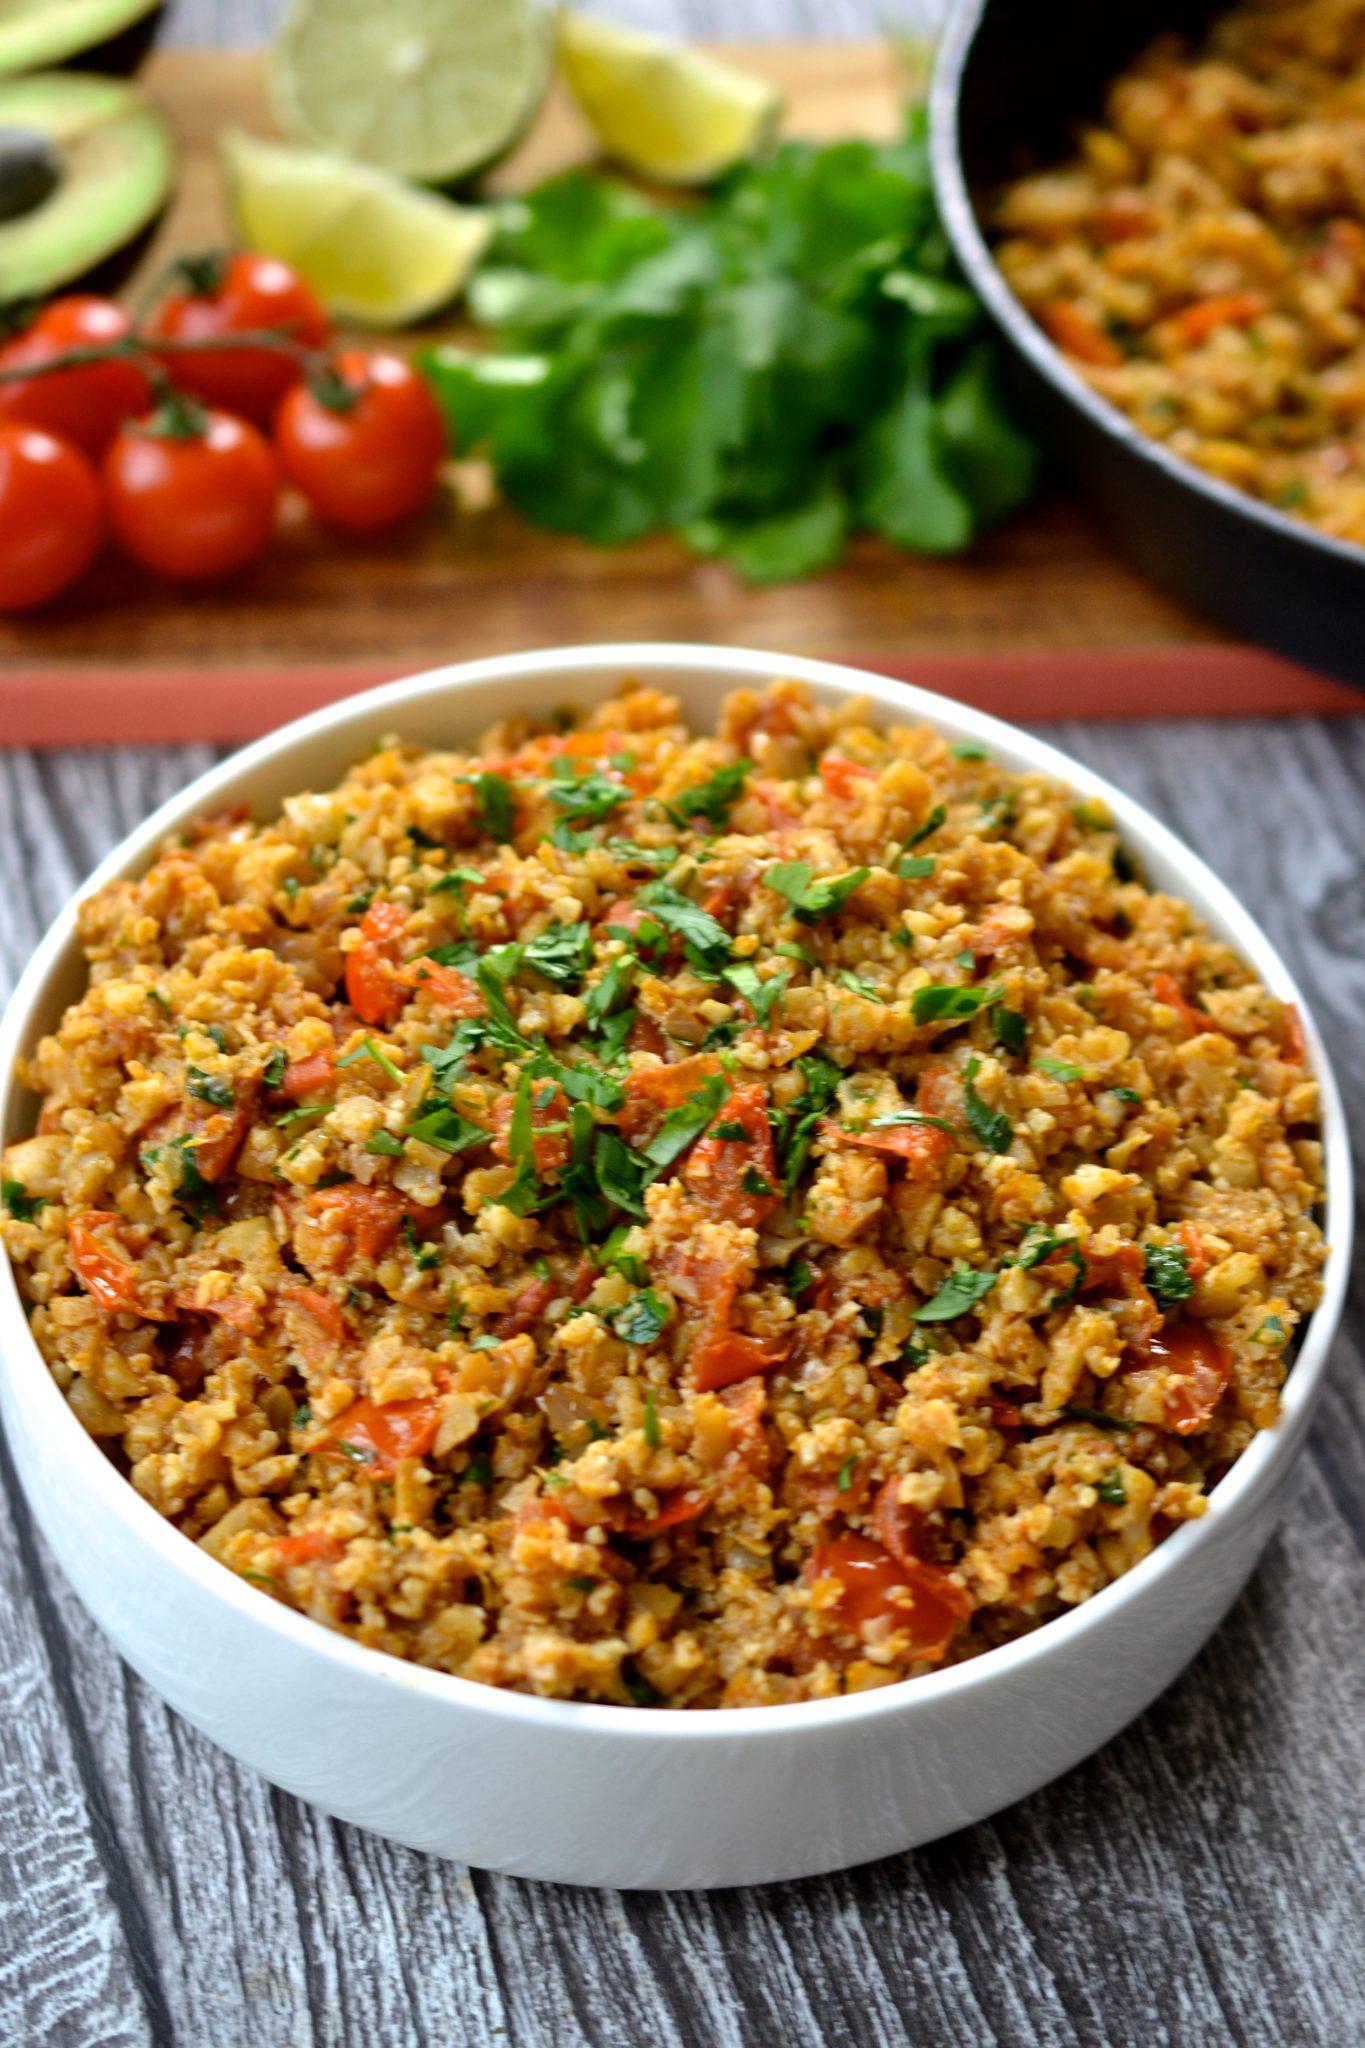 Mexican Cauliflower Rice Grain Gluten Free Paleo Whole30 Vegan